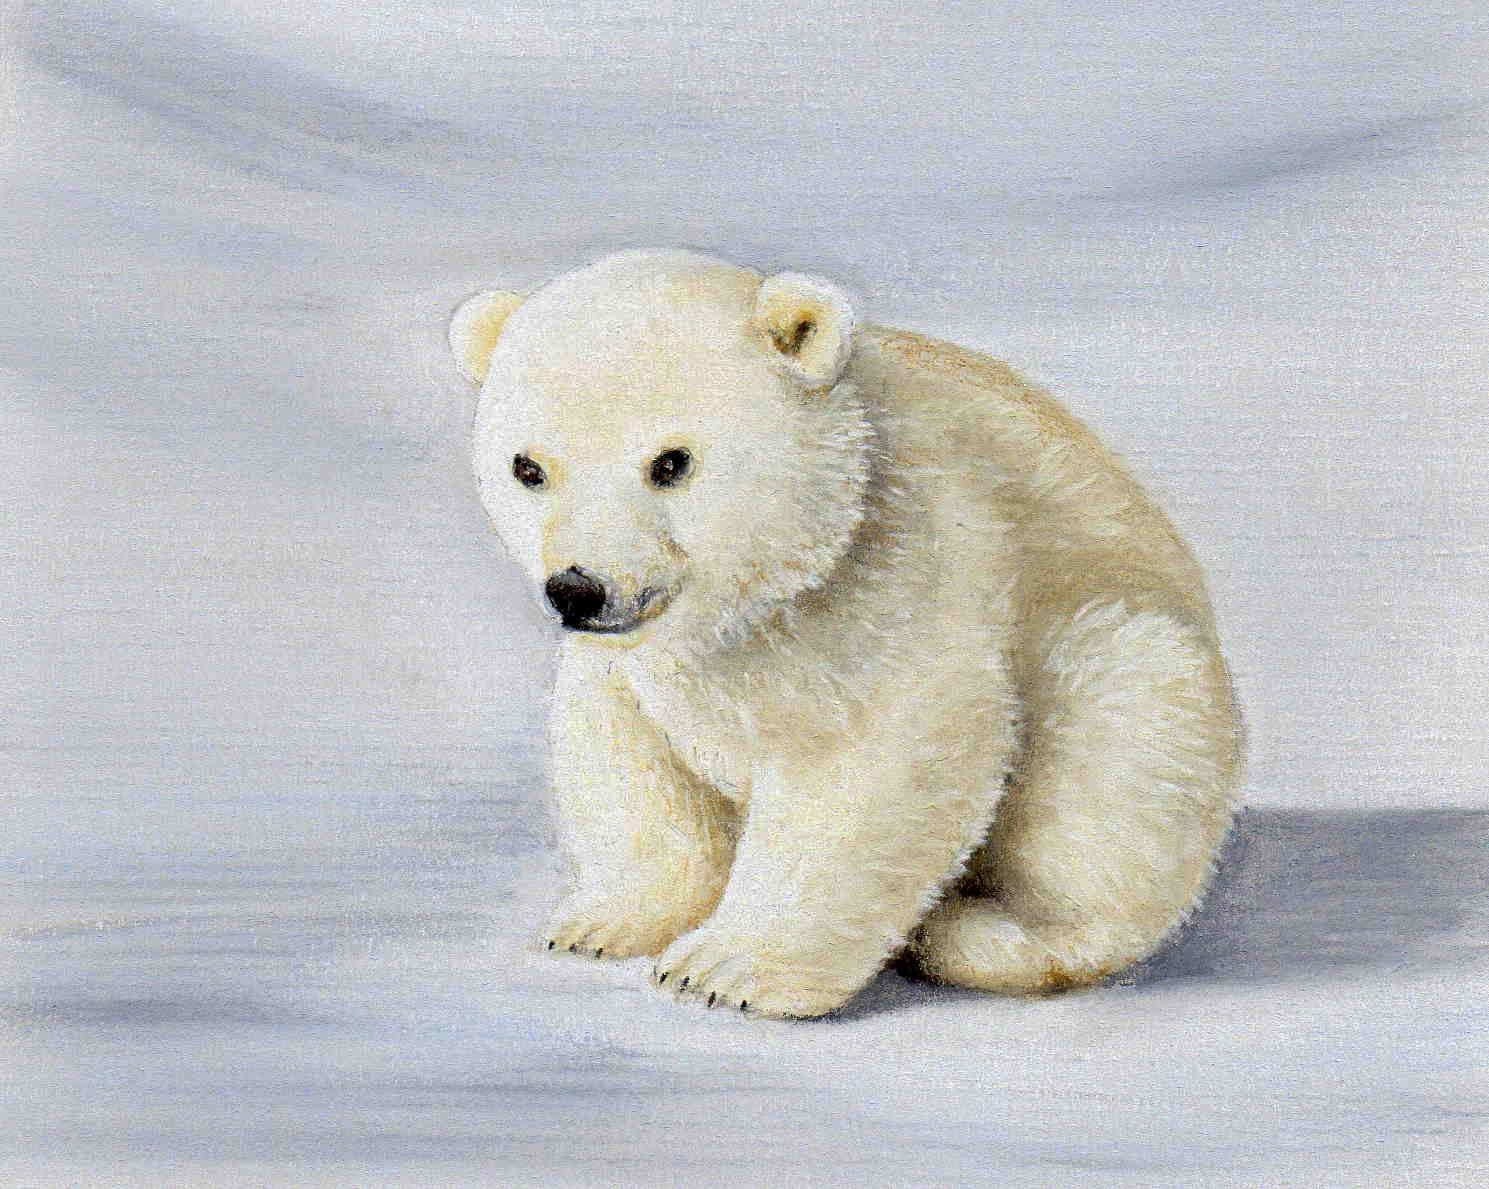 1489x1189 Baby Polar Bear001.jpg Pixels C. Bradley Pastel